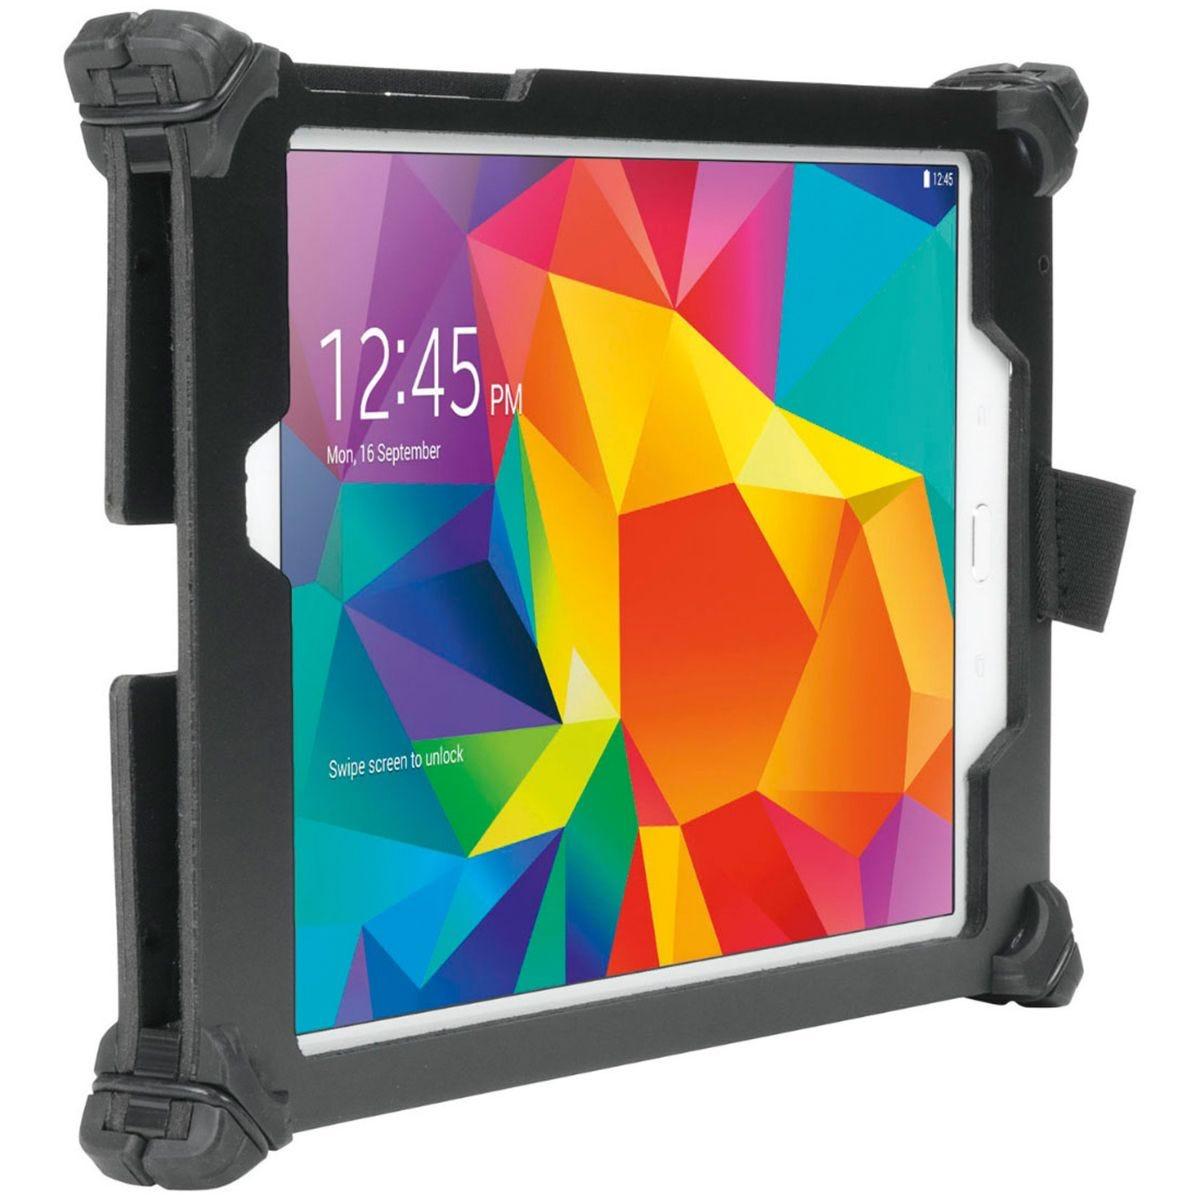 Mobilis RESIST Case for Galaxy Tab S2 9.7'' - Black